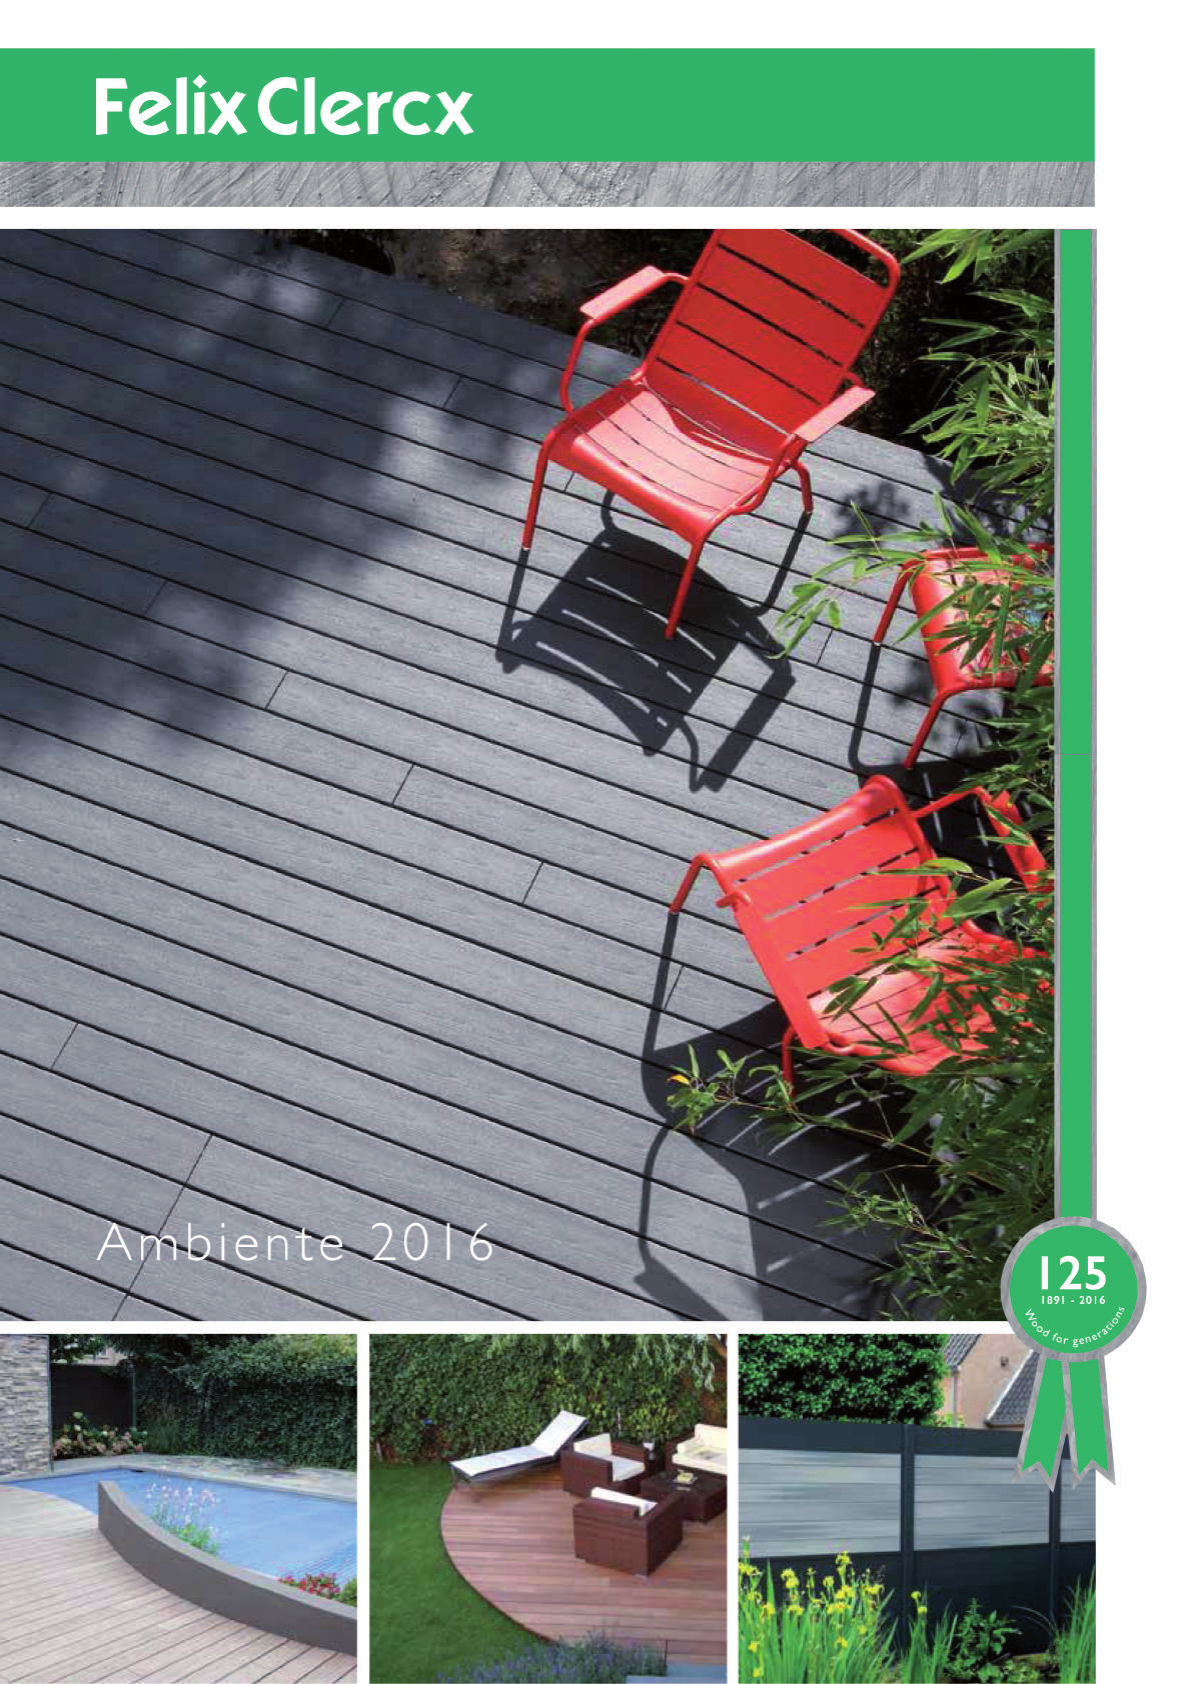 Gemüsegarten Anlegen Ideen Frisch Terrassenboden Und Sichtschutz Felix Clercx Katalog [pdf